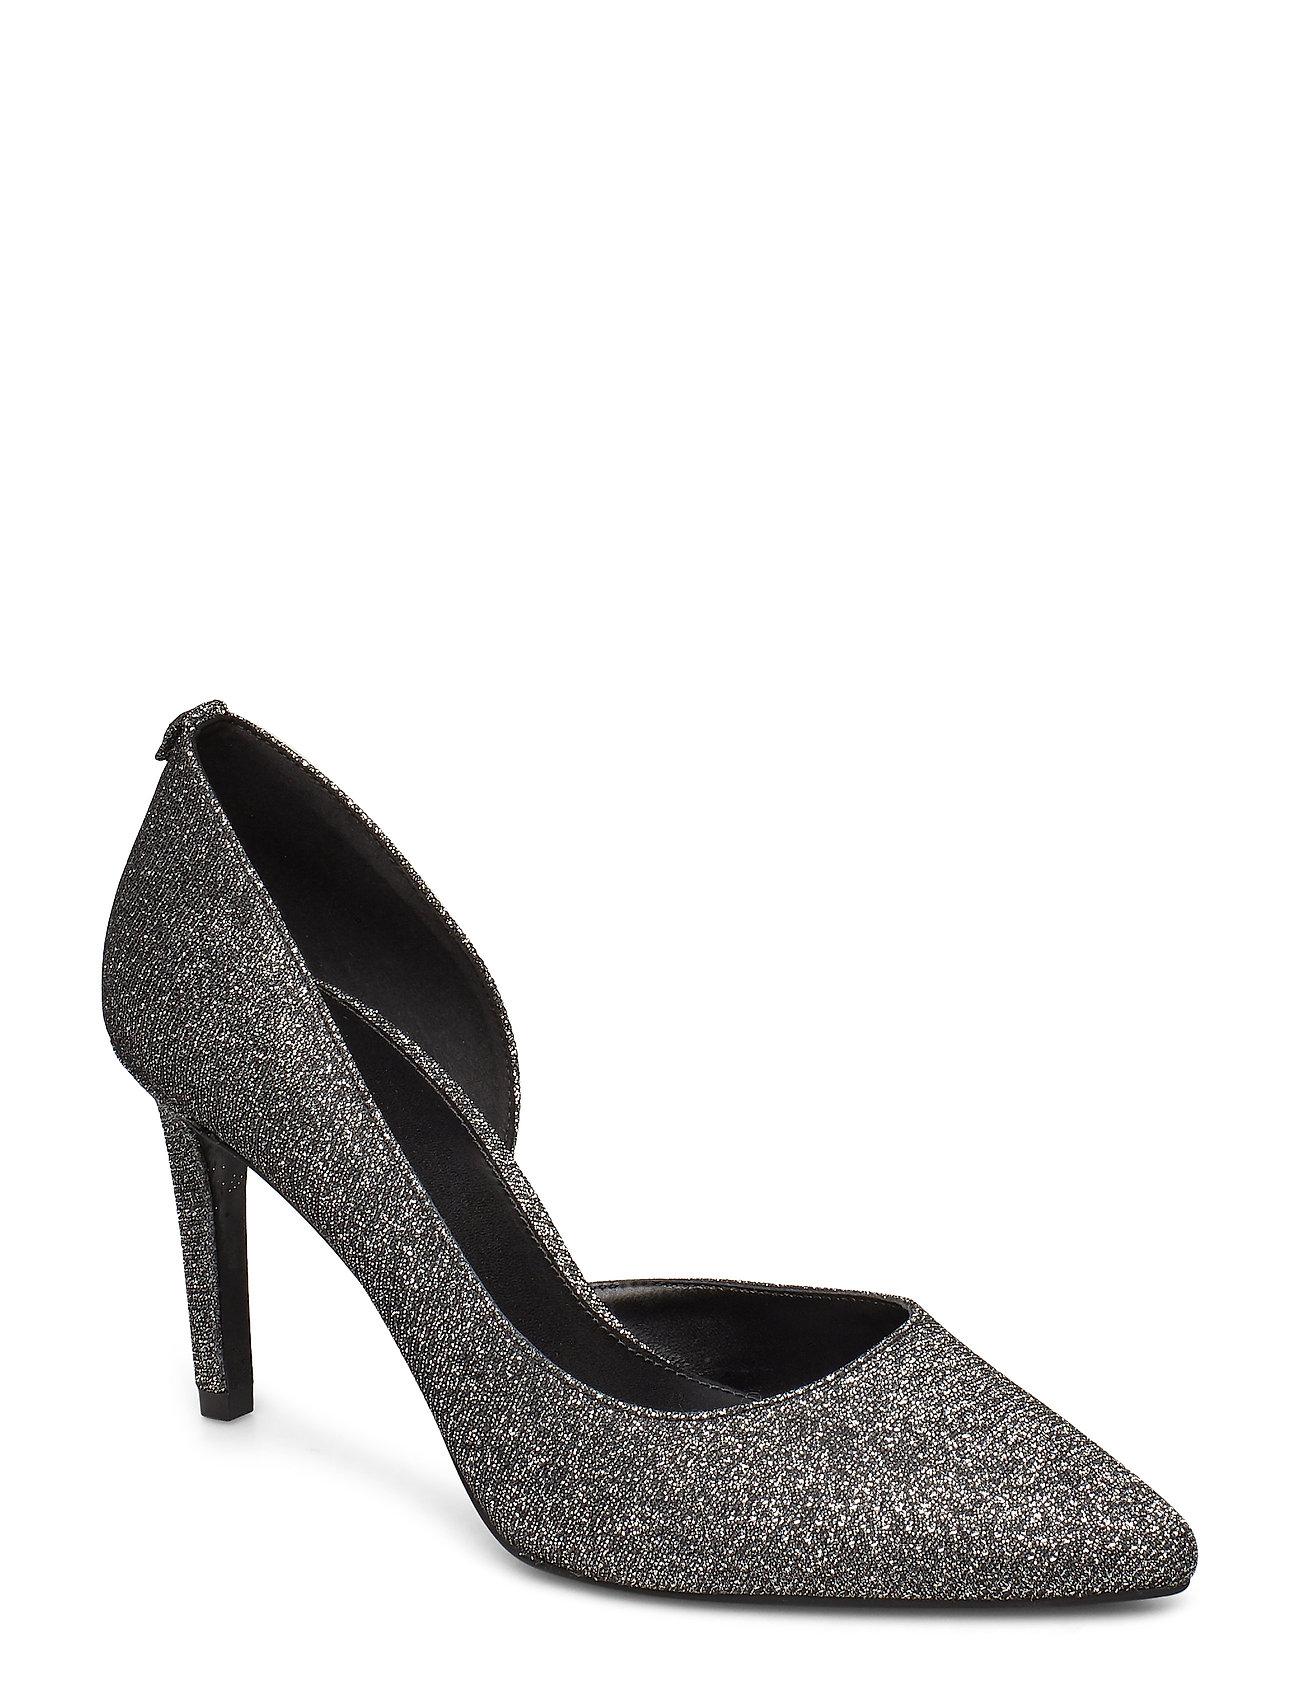 Michael Kors Shoes DOROTHY FLEX D'ORSAY - BLK/SILVER